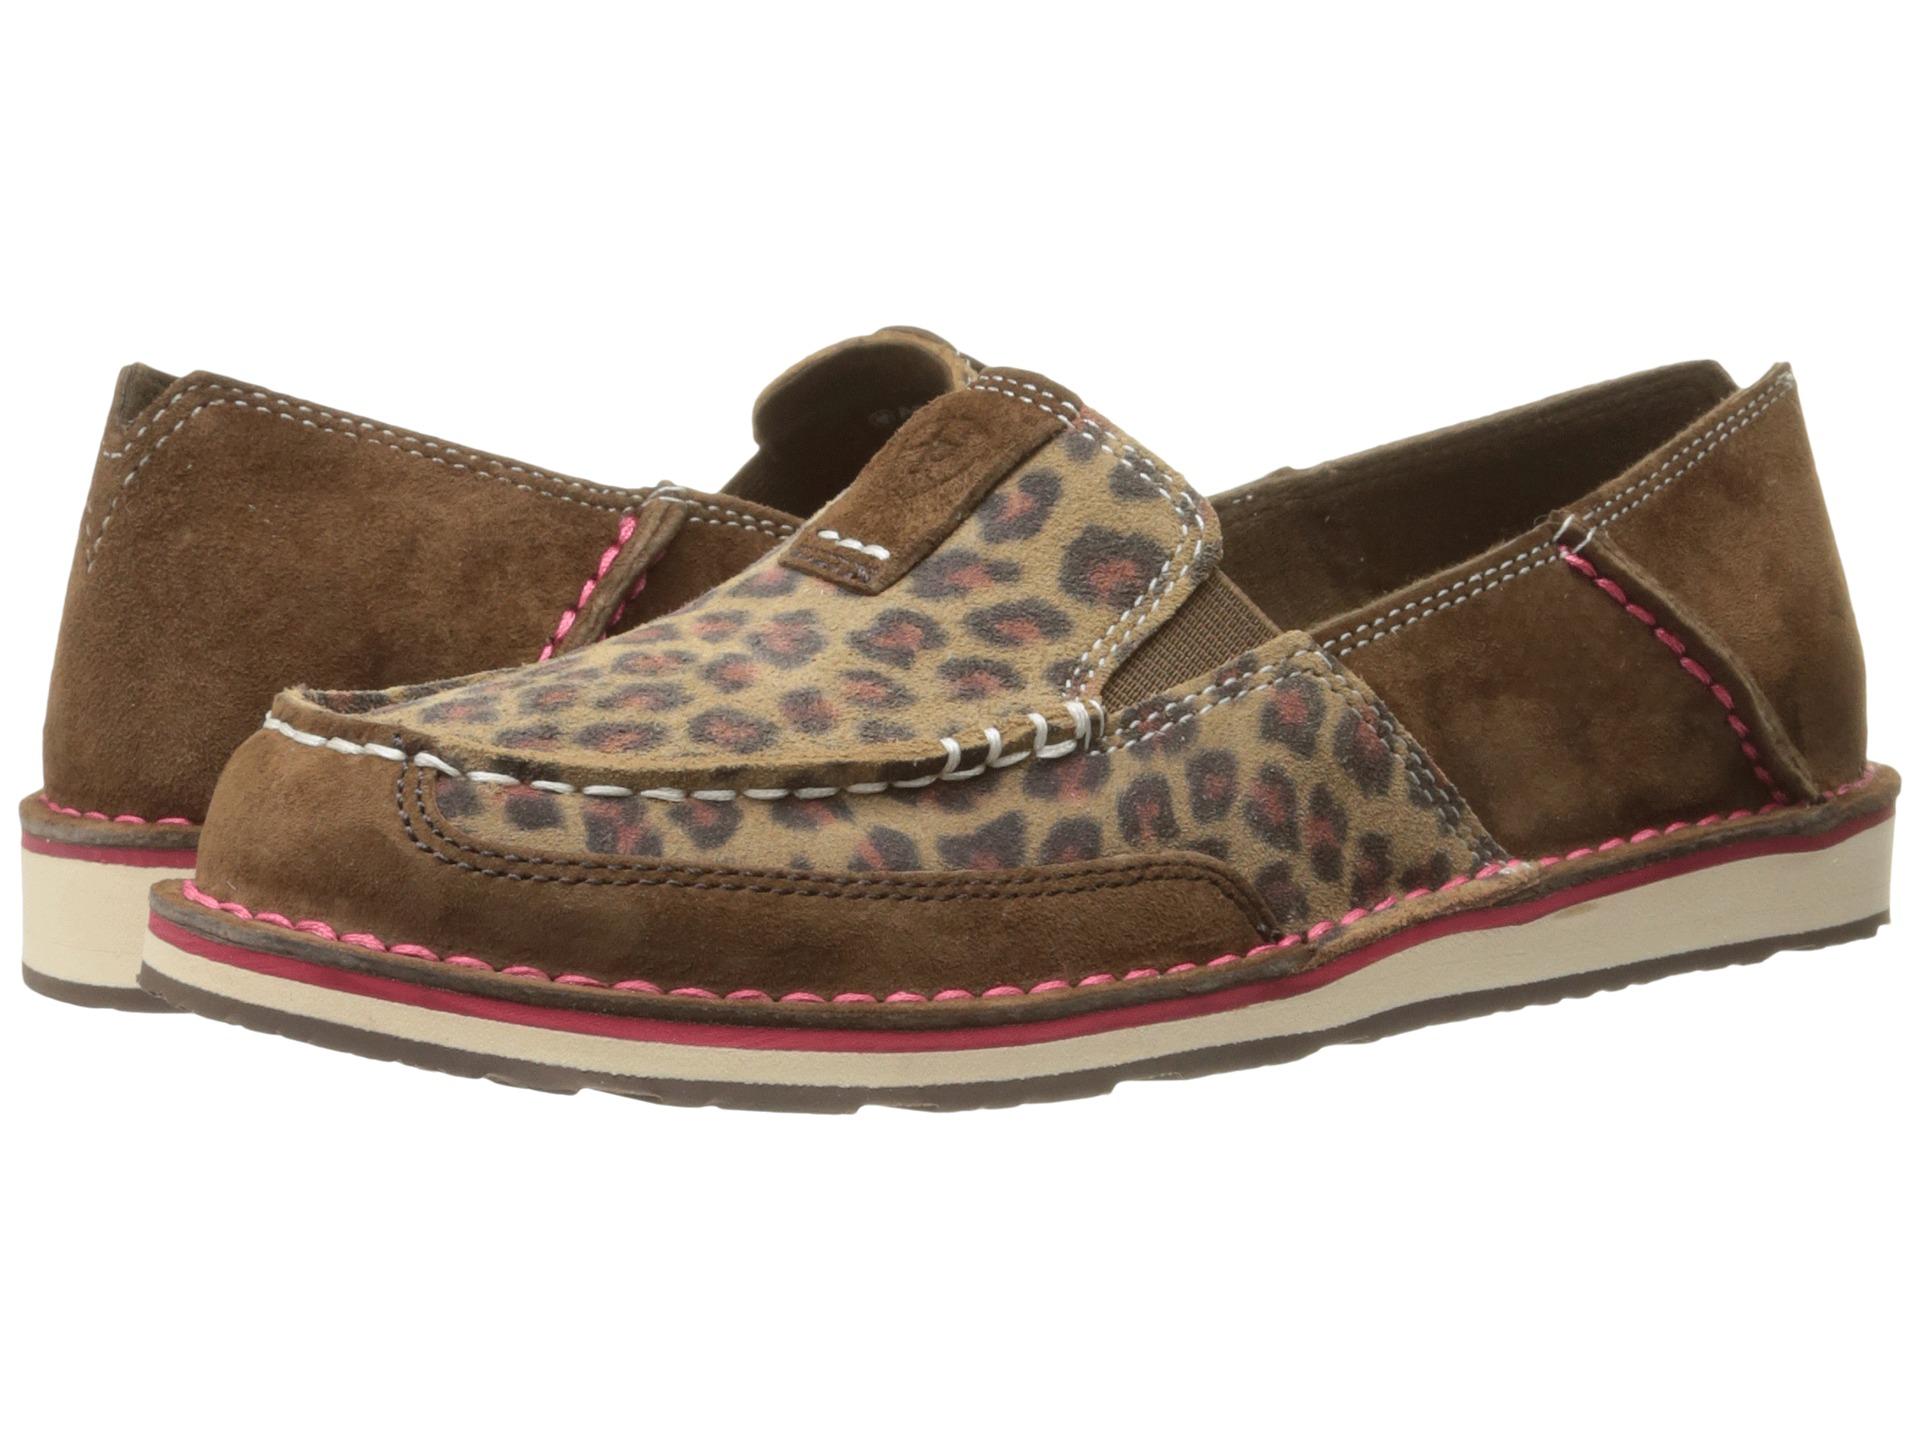 Boys Cruiser Shoes Size